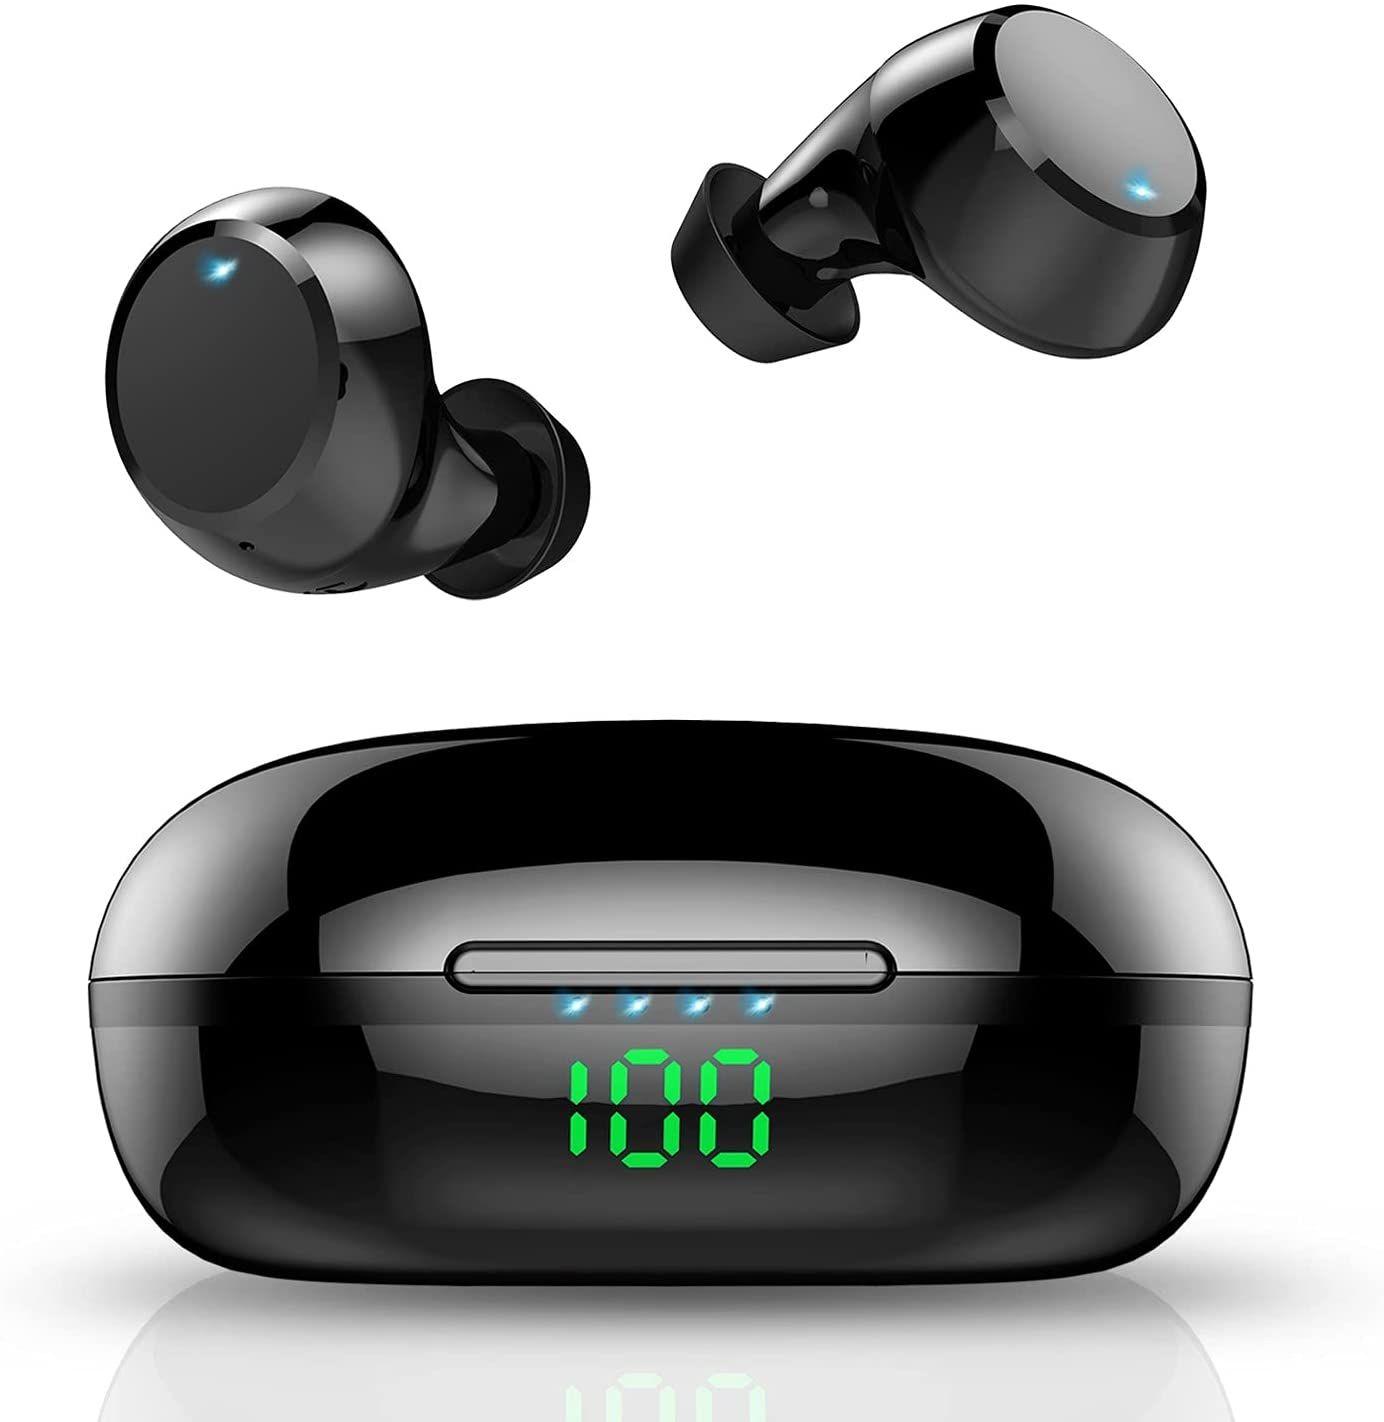 Tiksounds Auriculares Bluetooth 36 horas